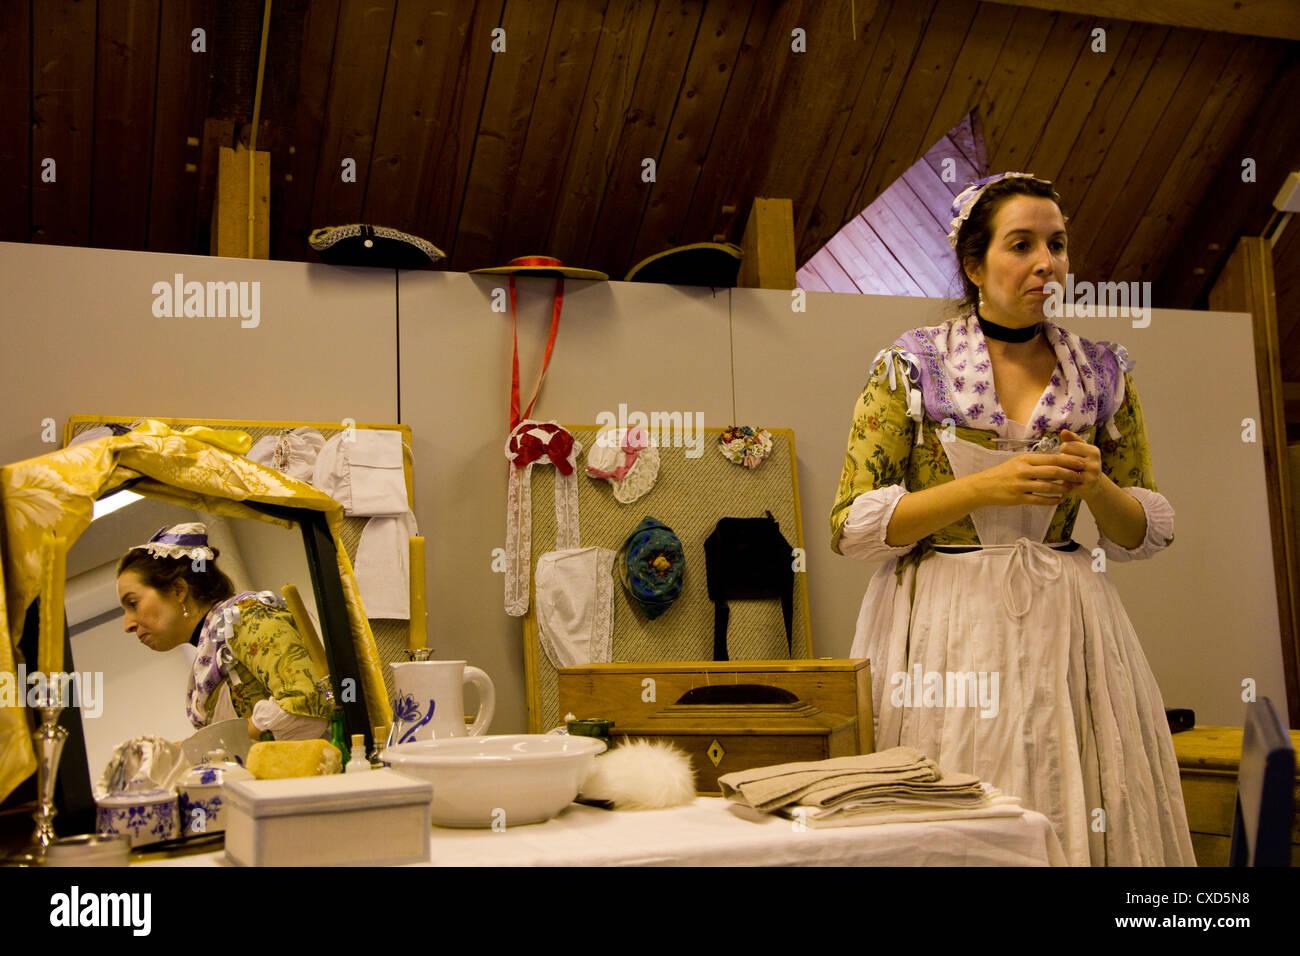 Costumed interpreter, New France Festival, Quebec City, Canada - Stock Image